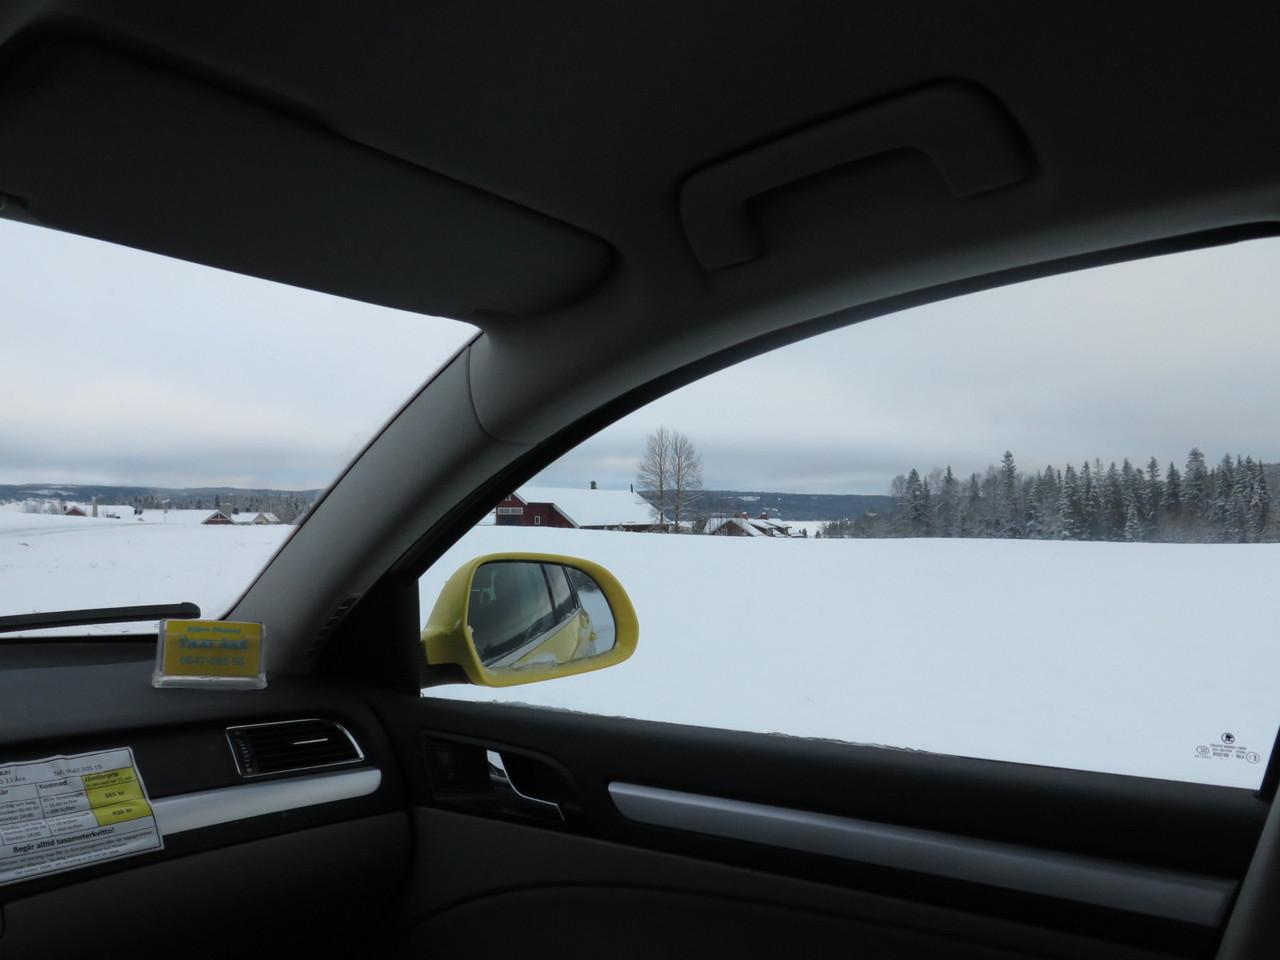 A chegada à aldeia chamada Fäviken